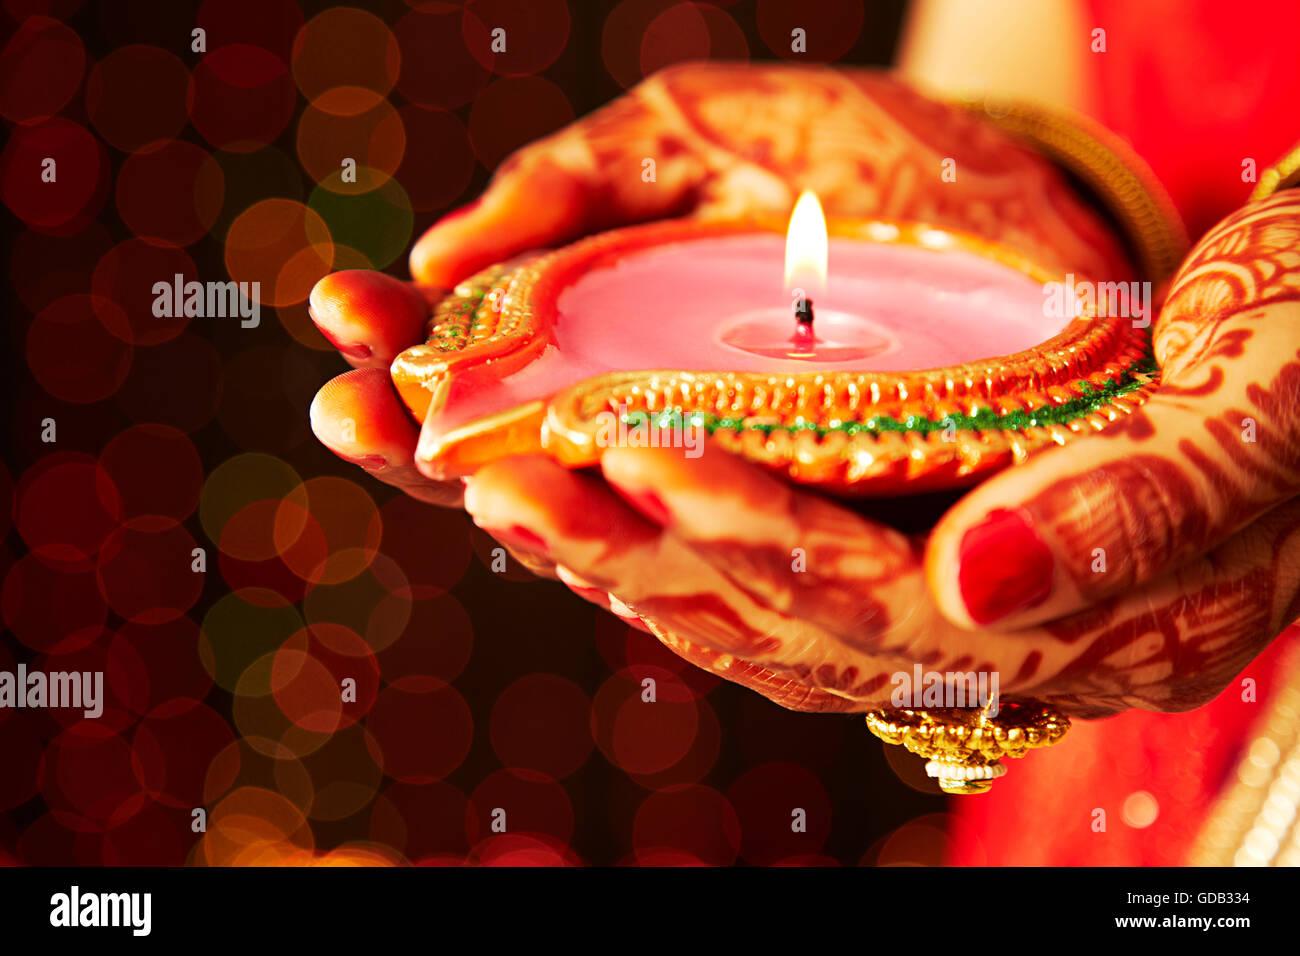 Diwali Diyas Online Shopping India: 1 Indian Adult Woman Bride Diwali Festival Hands-cupped